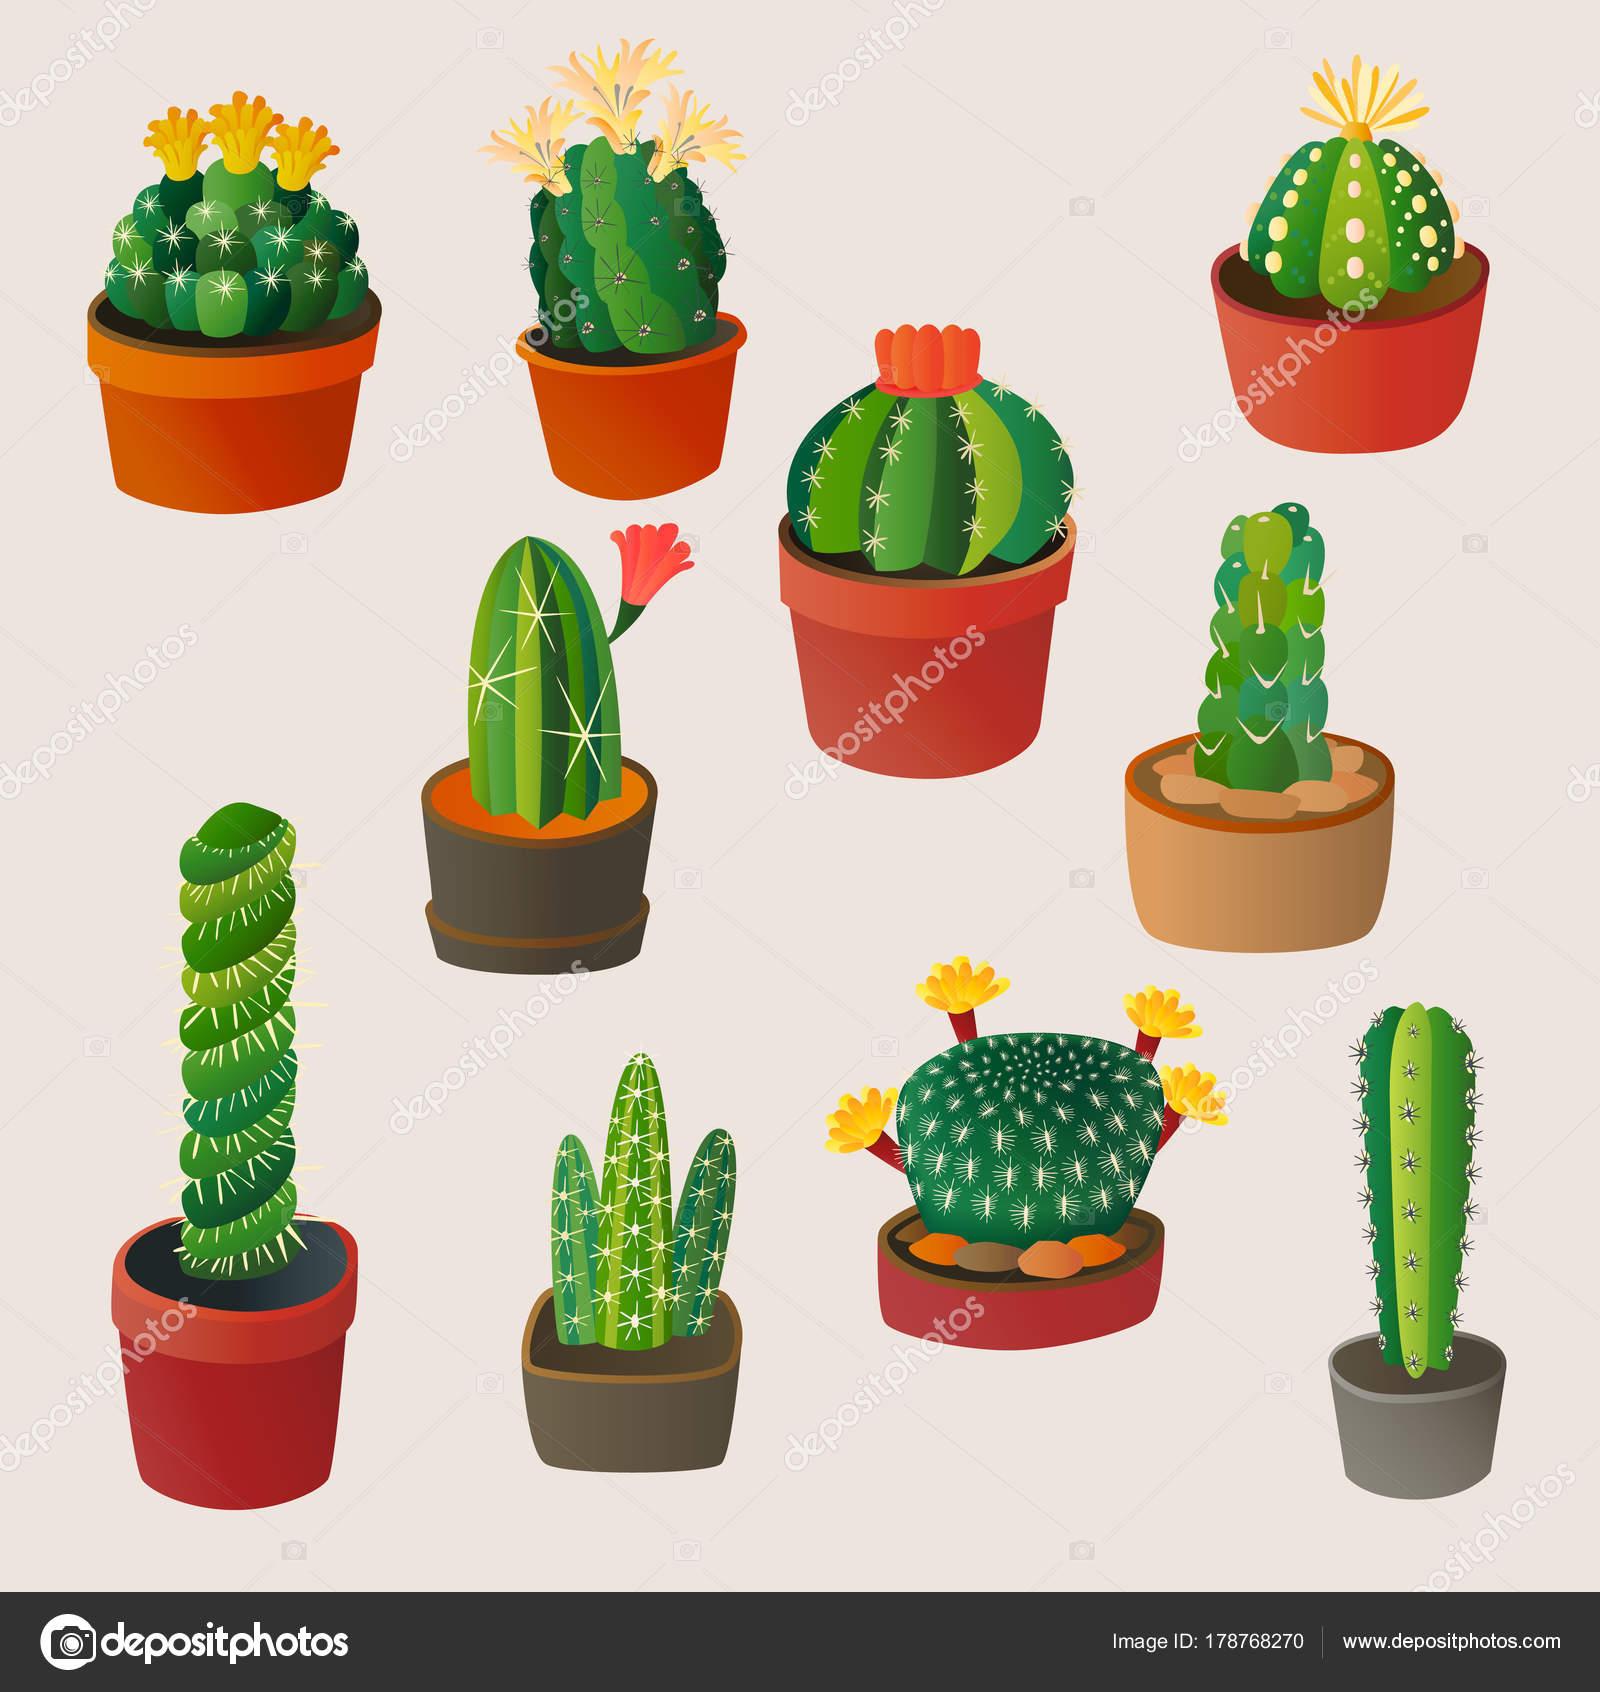 Dessin Animé Mignon Cactus Plante Maison Nature Vector